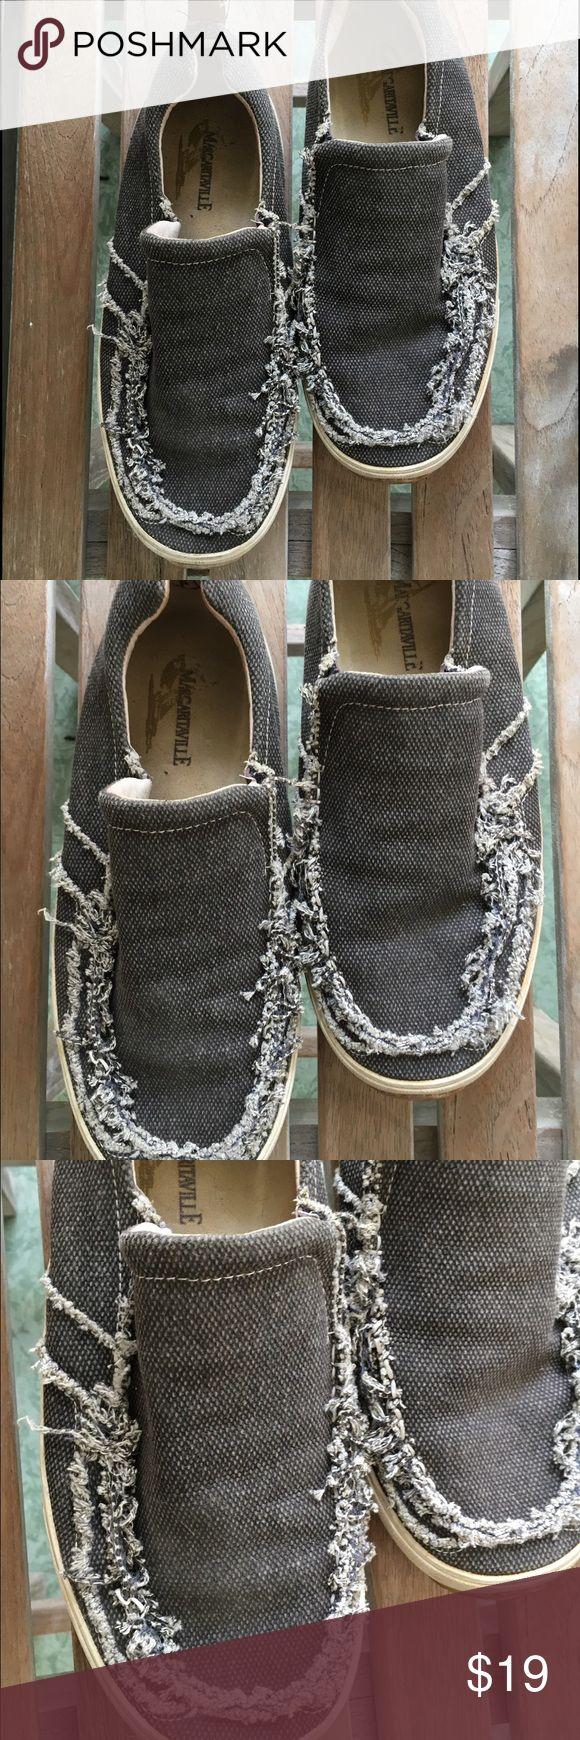 Margaritavile distressed men's slip on shoes Casual beach shoes margaritavile Shoes Loafers & Slip-Ons